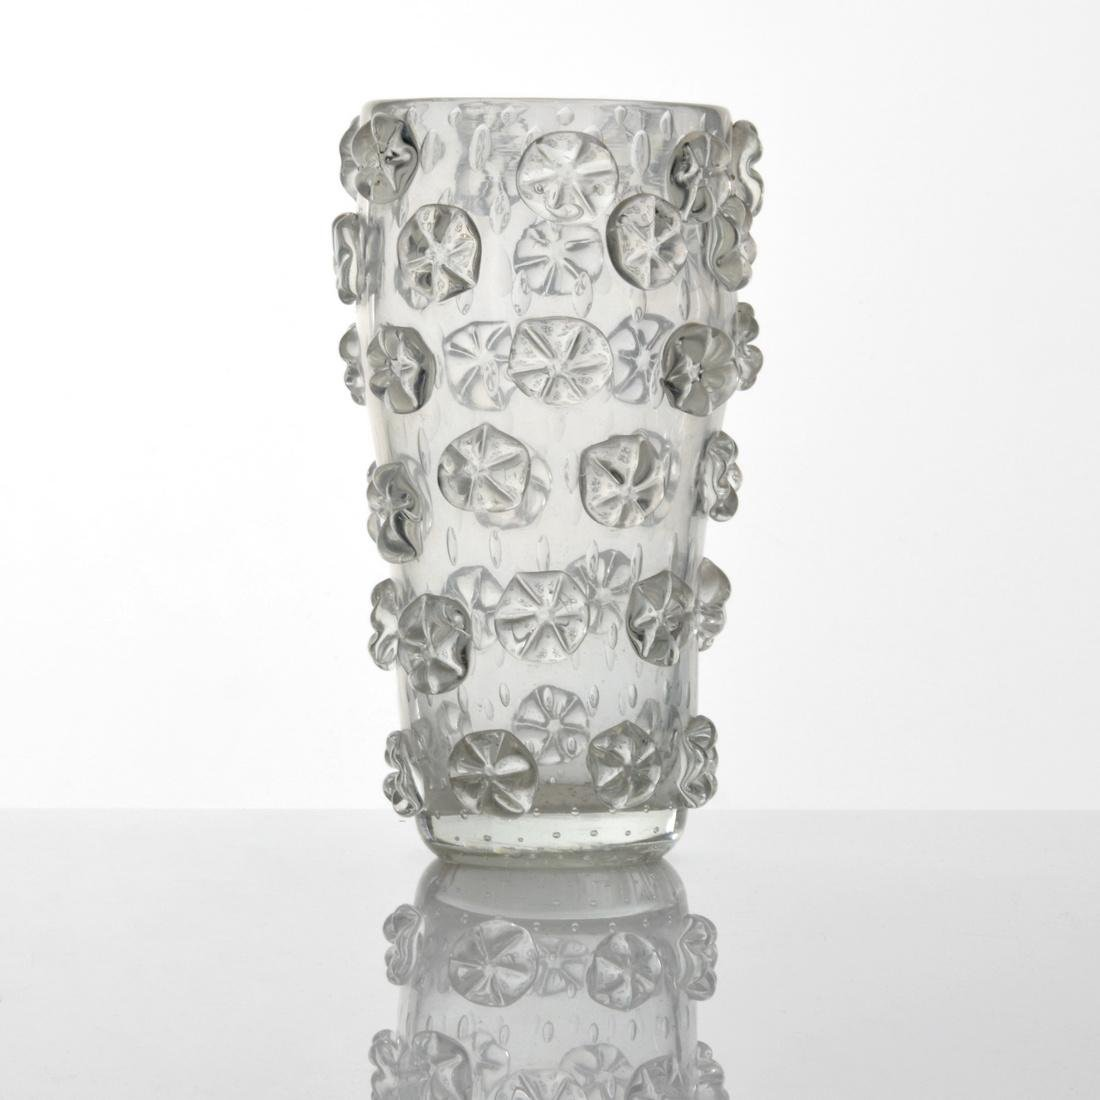 Ercole Barovier A STELLE Vase